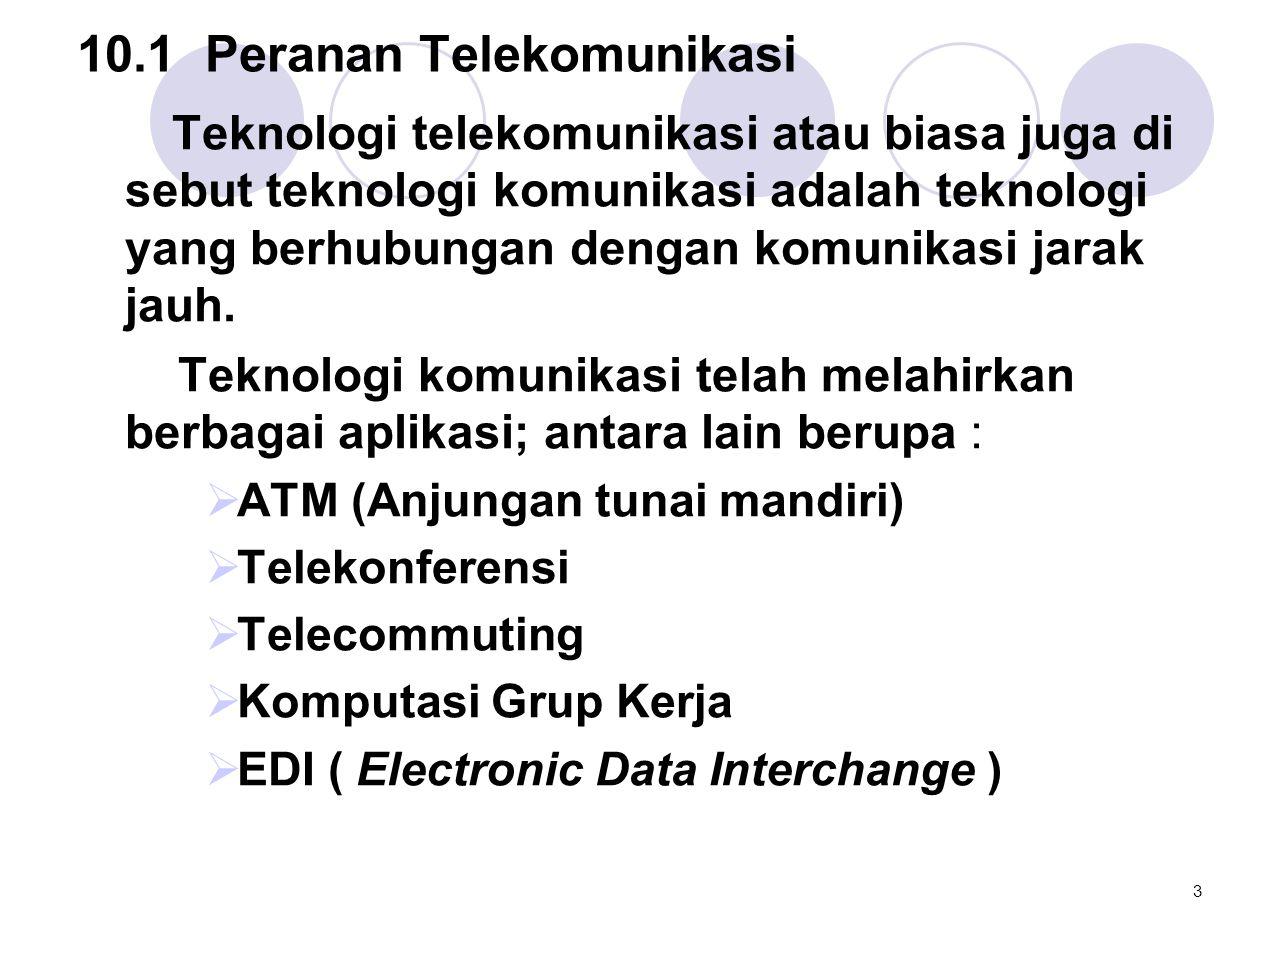 10.1Peranan Telekomunikasi Teknologi telekomunikasi atau biasa juga di sebut teknologi komunikasi adalah teknologi yang berhubungan dengan komunikasi